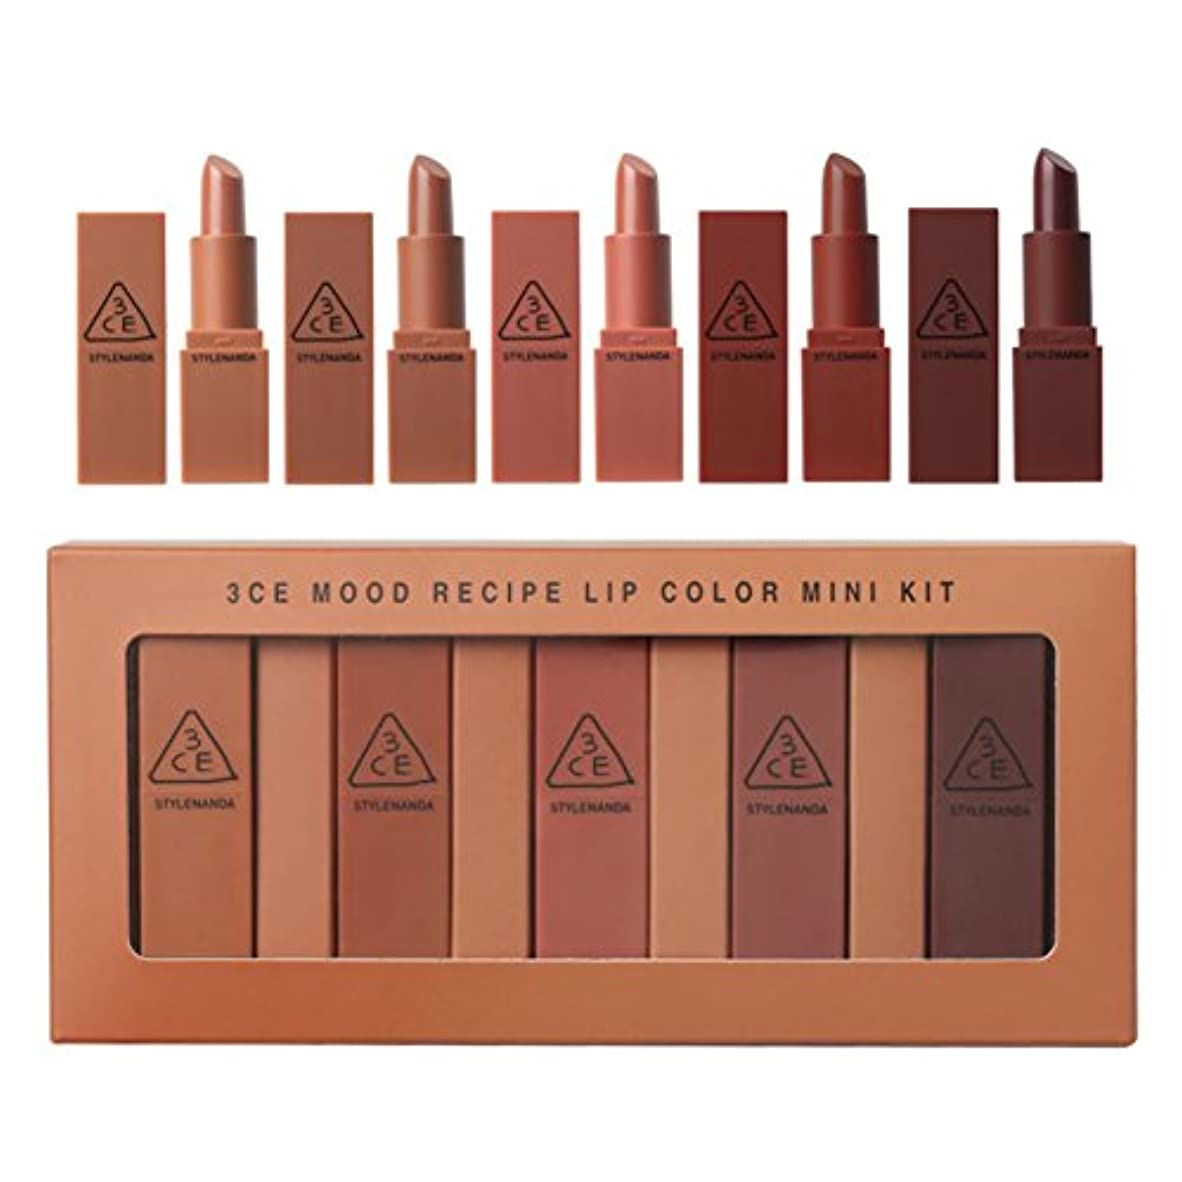 3CE mood recipe lip color mini kit 3CE ムードレシピ リップ カラー ミニ キット[並行輸入品]